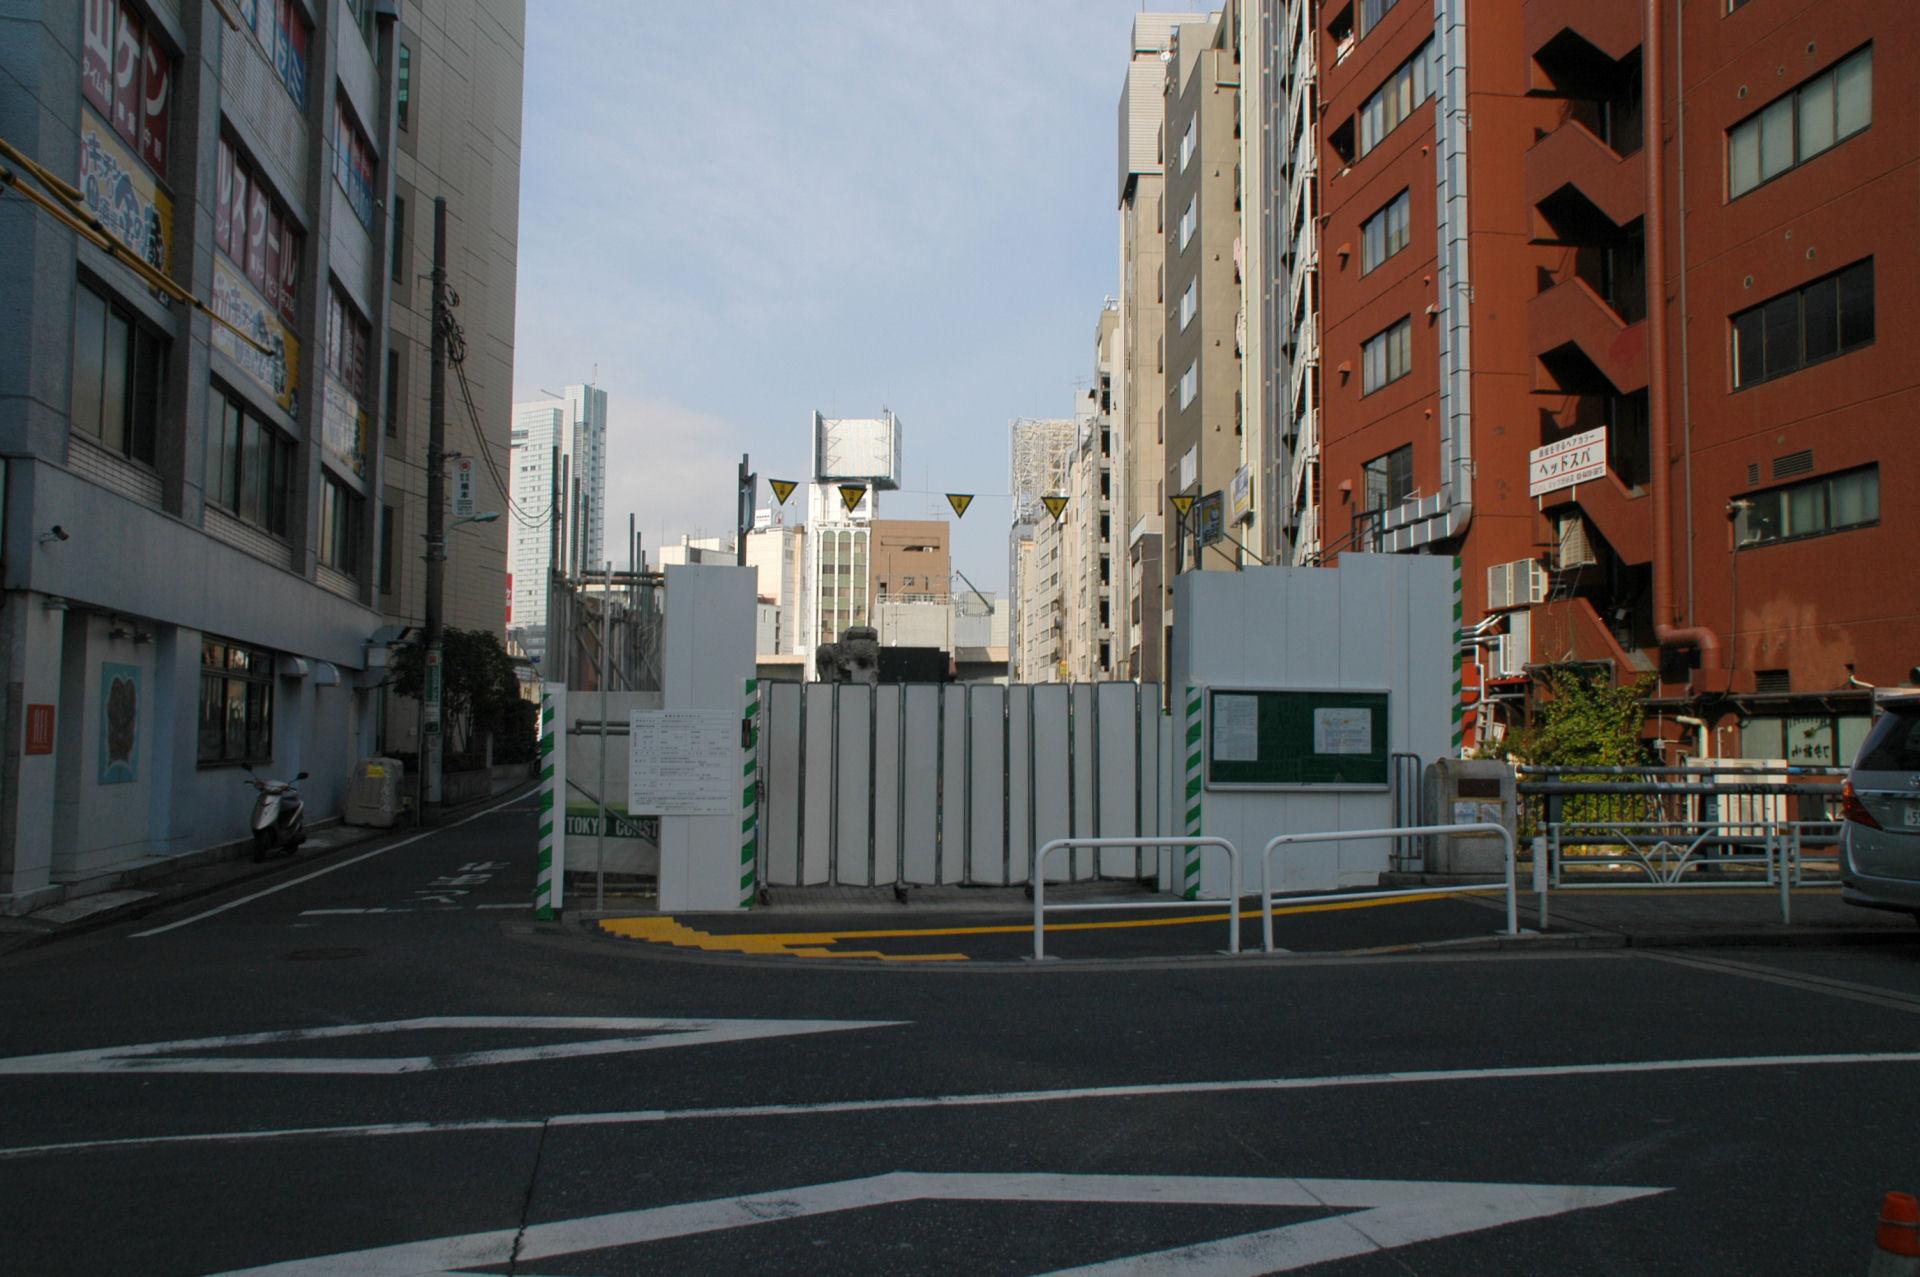 shibusou14020022.jpg